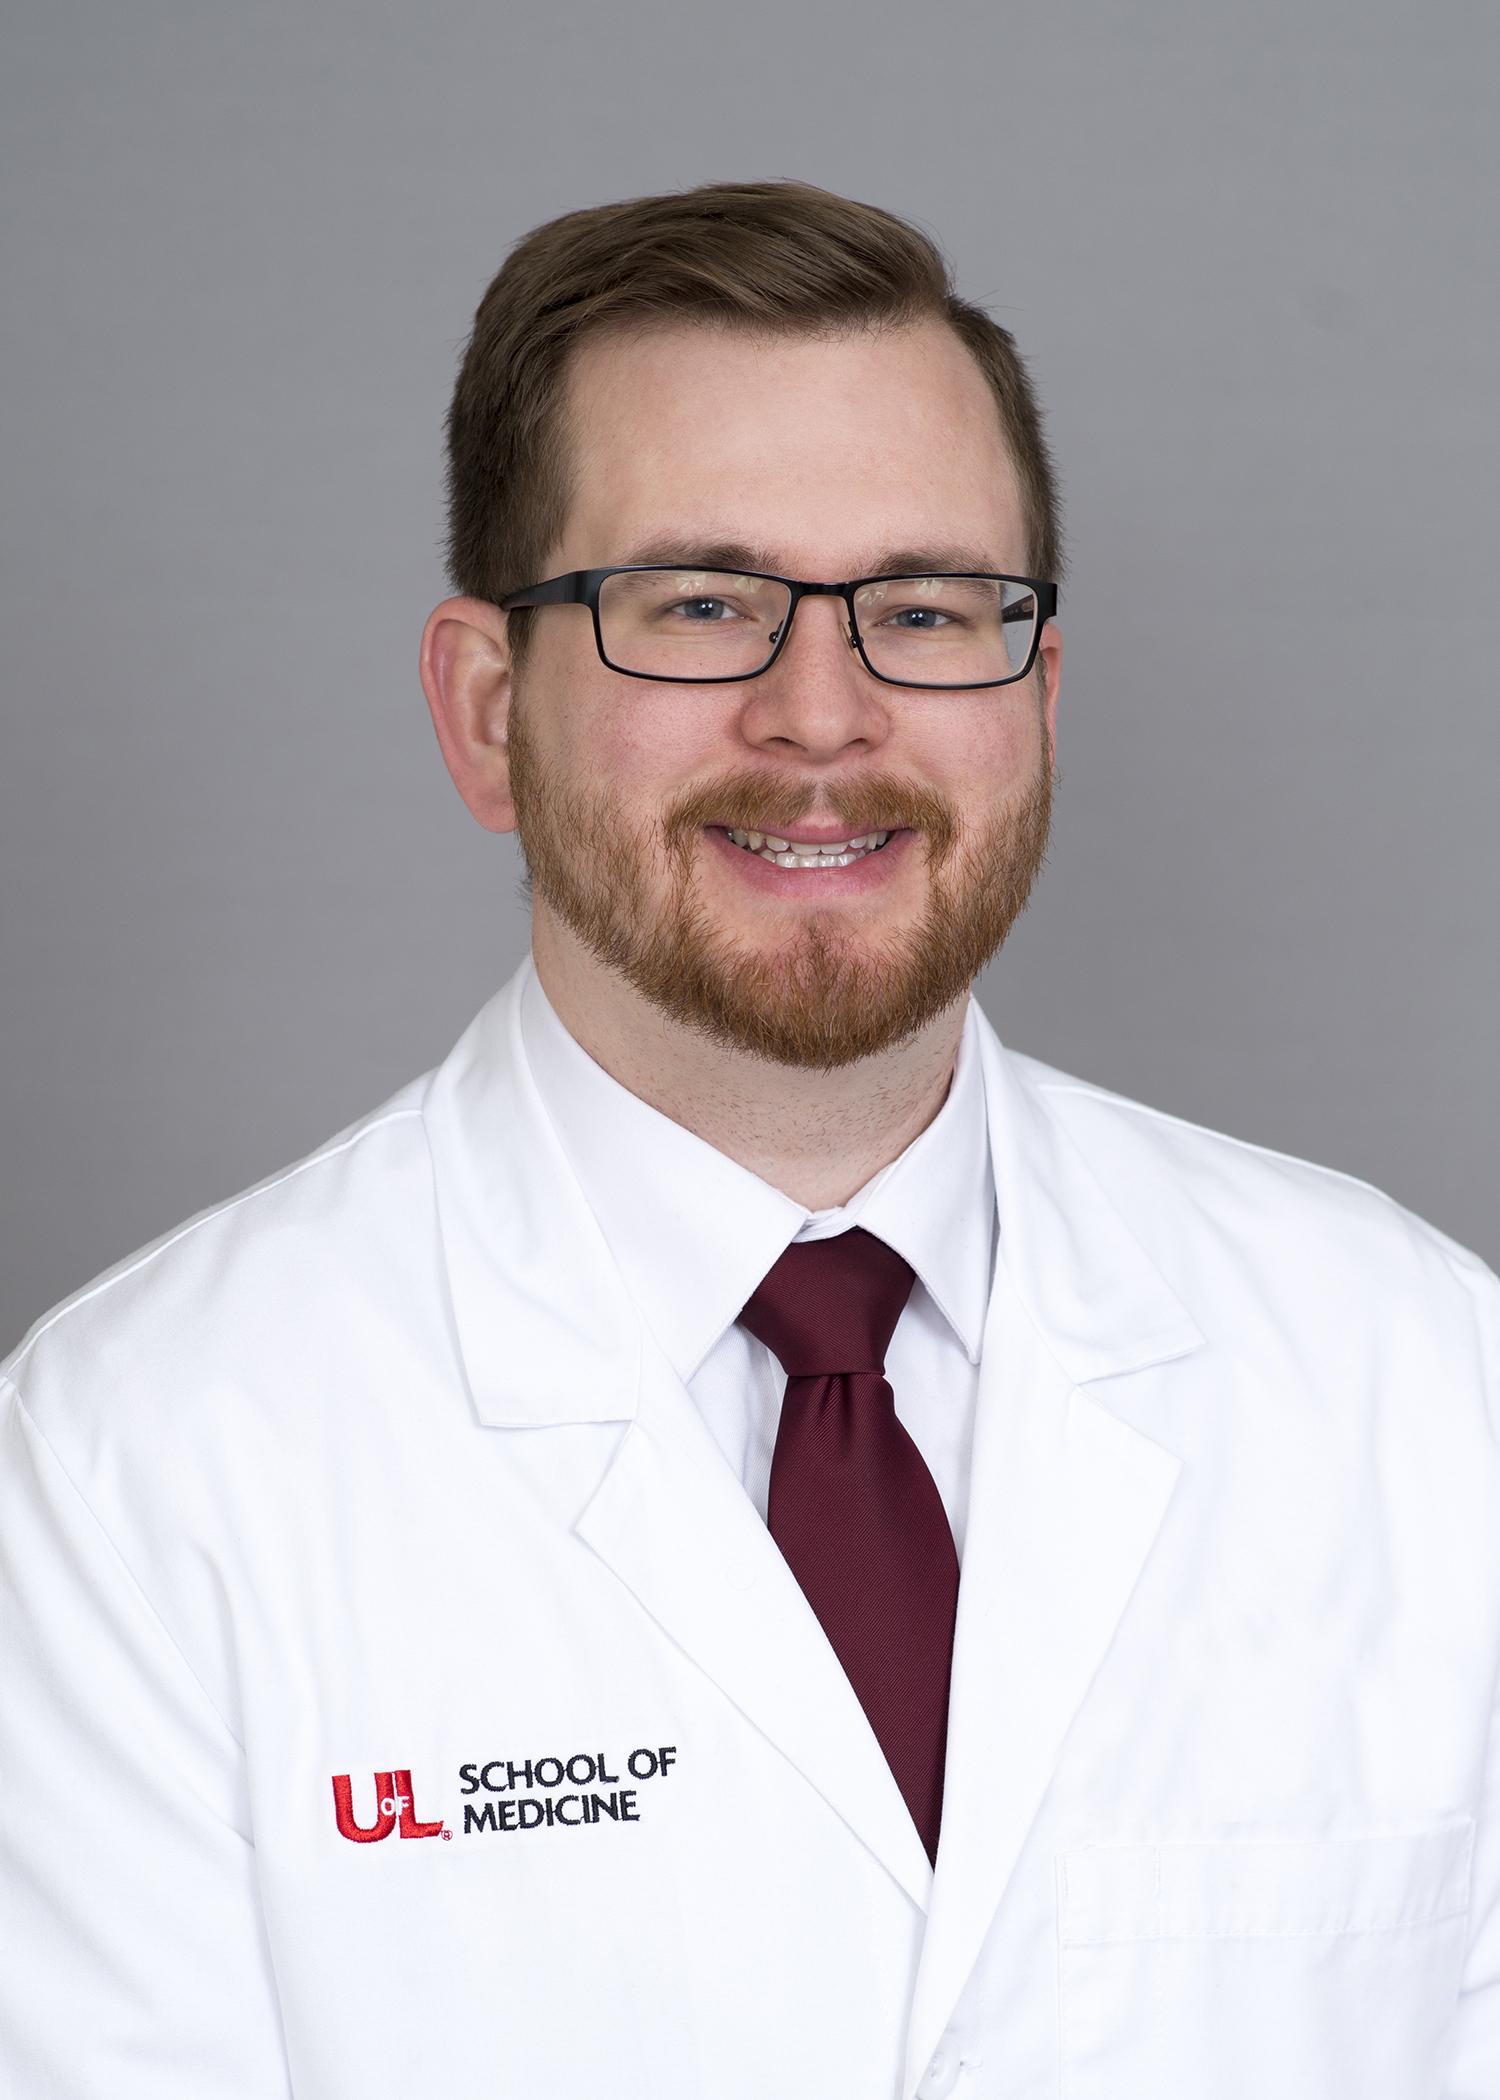 Dr. Matt Wilson